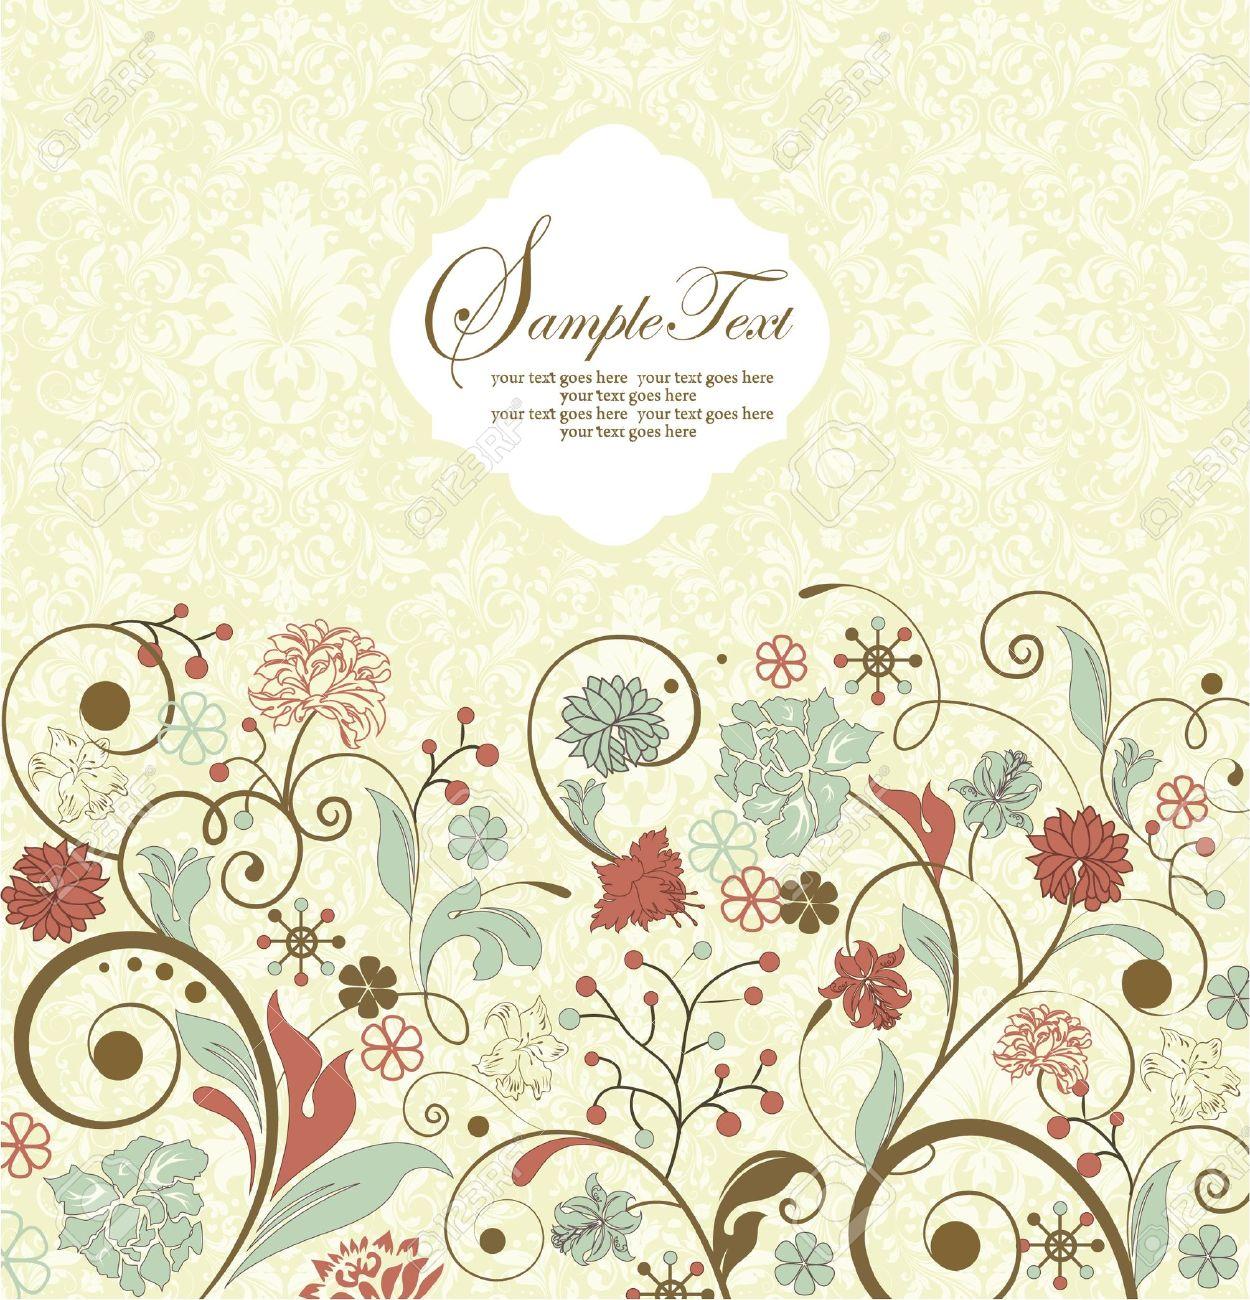 Vintage invitation card with floral background and place for vector vintage invitation card with floral background and place for text stopboris Images